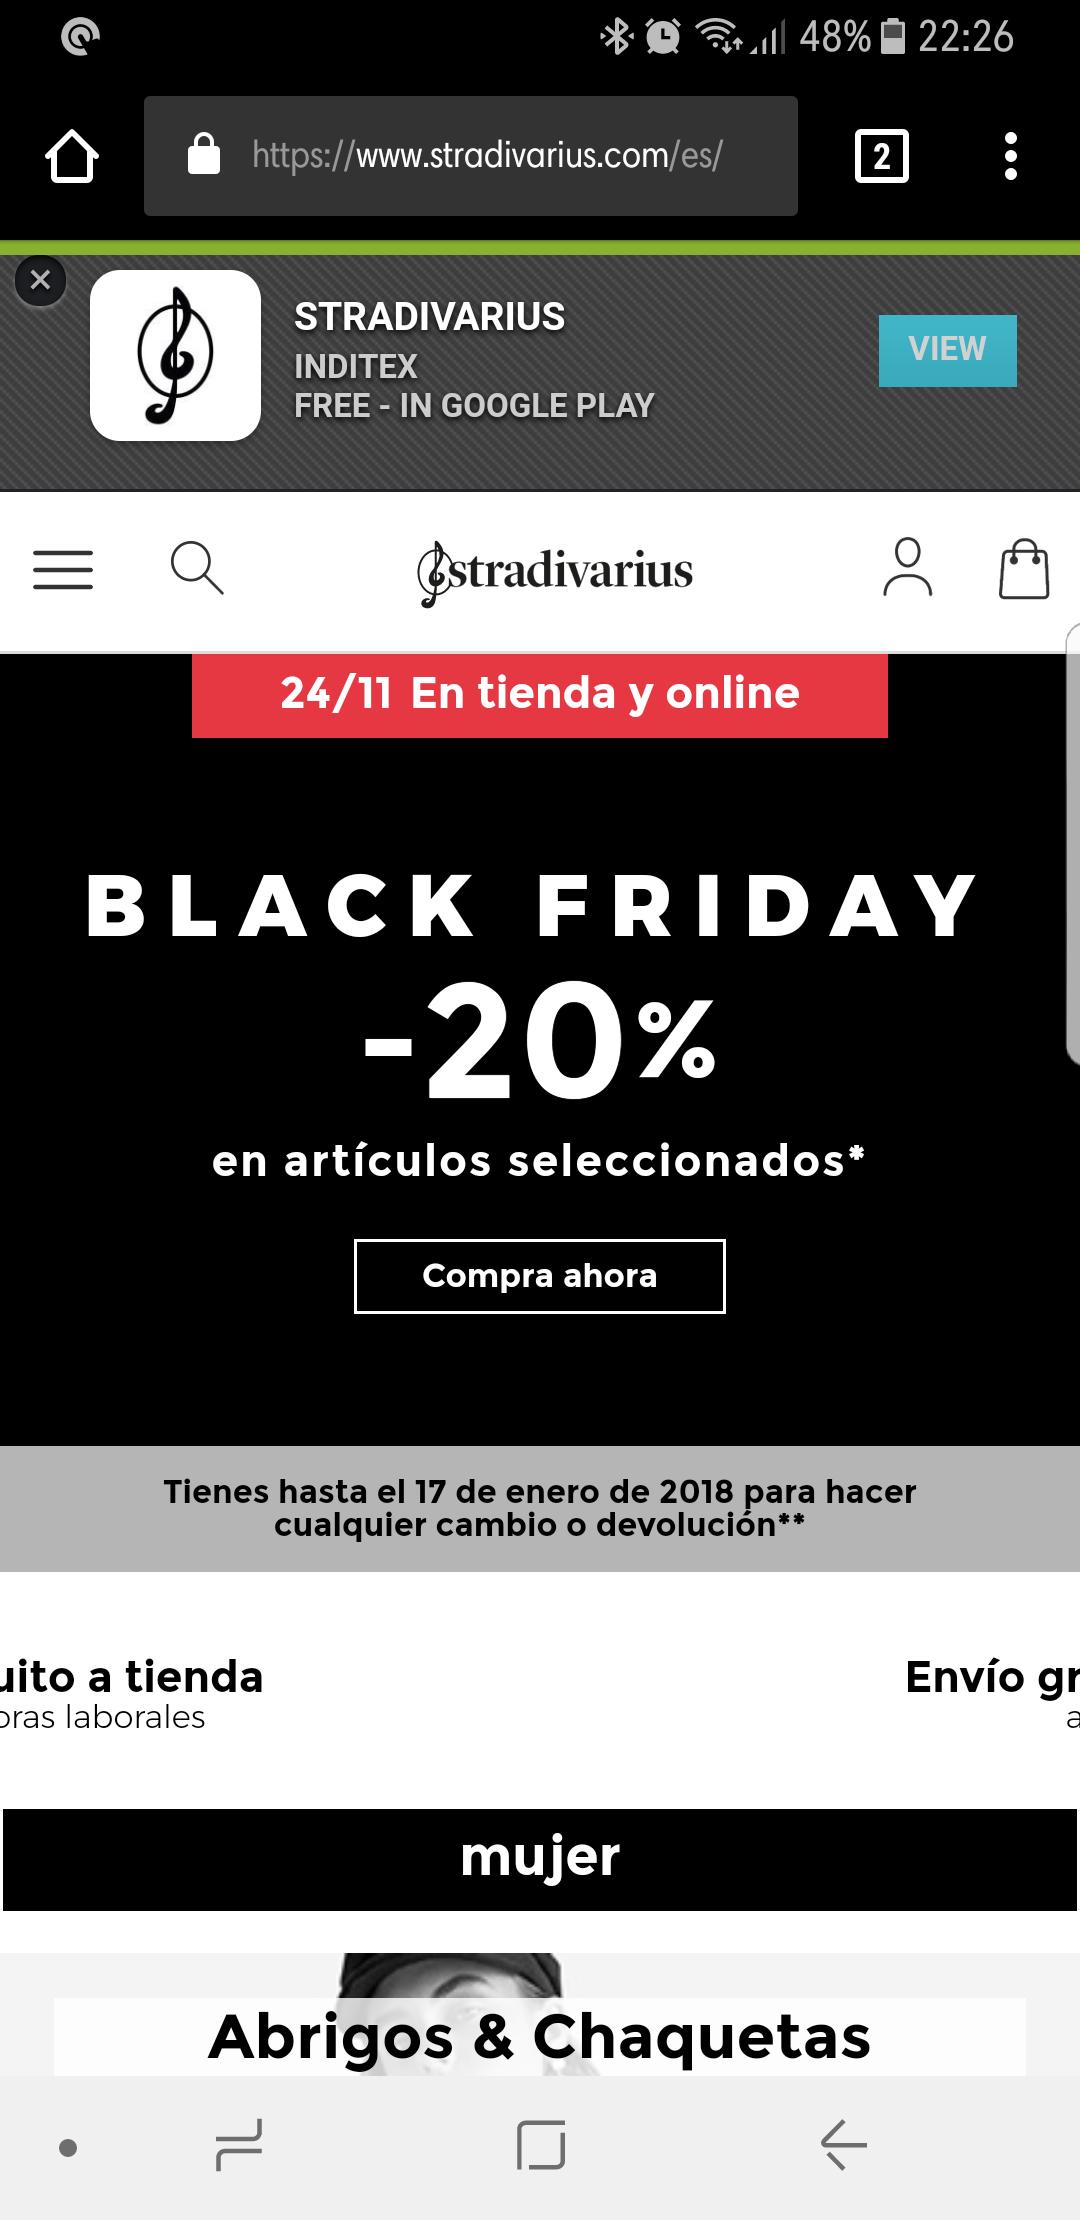 20% descuento Stradivarius - Black Friday